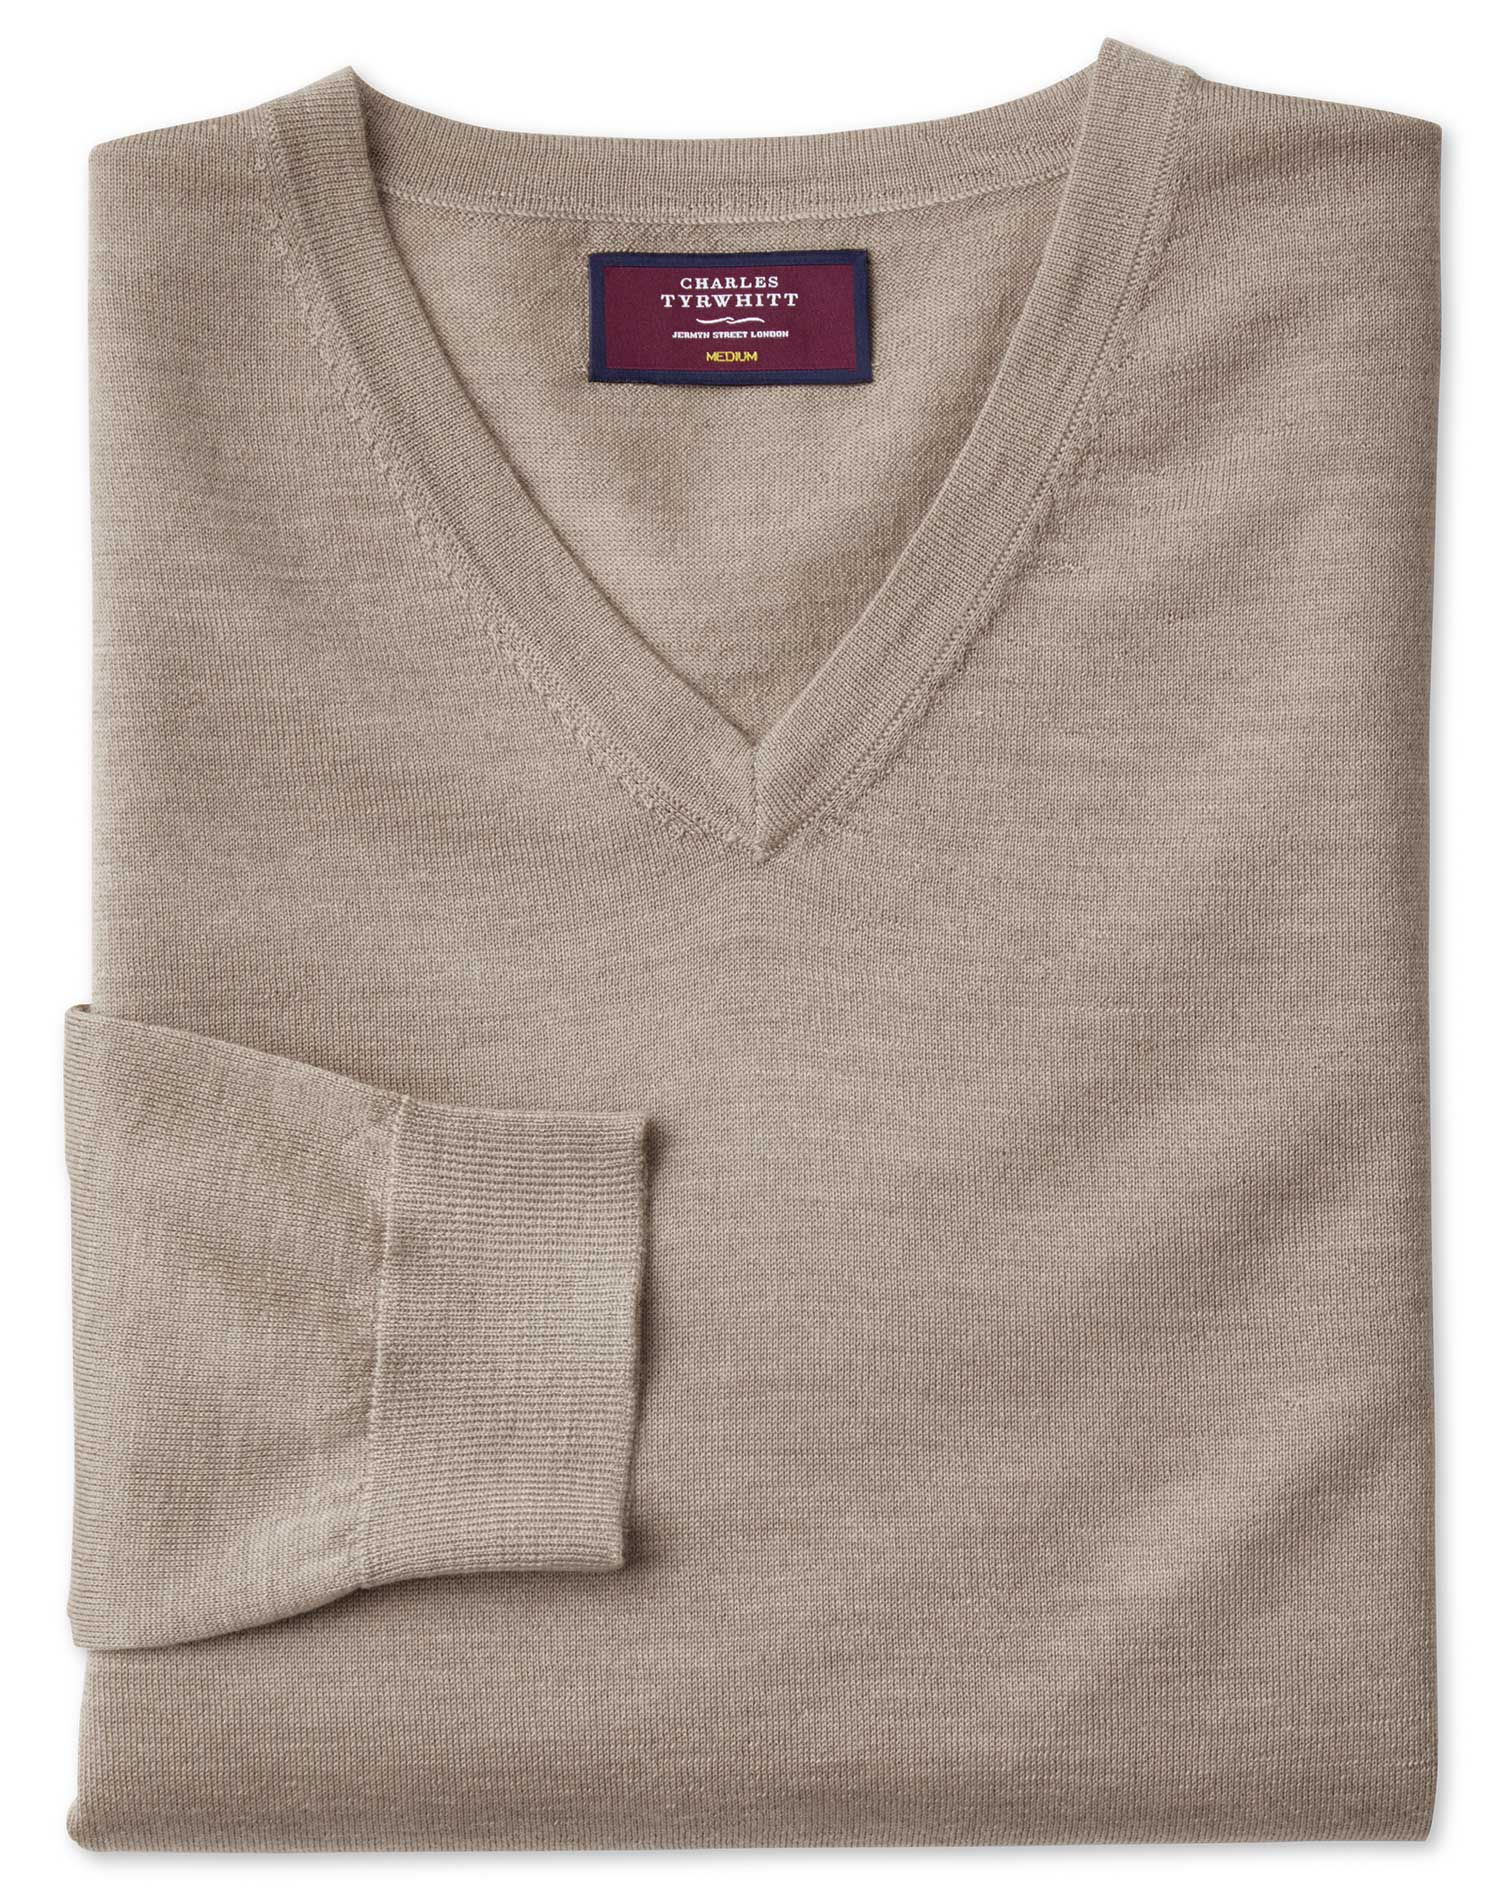 Stone Merino Silk V-Neck Jumper Size Large by Charles Tyrwhitt